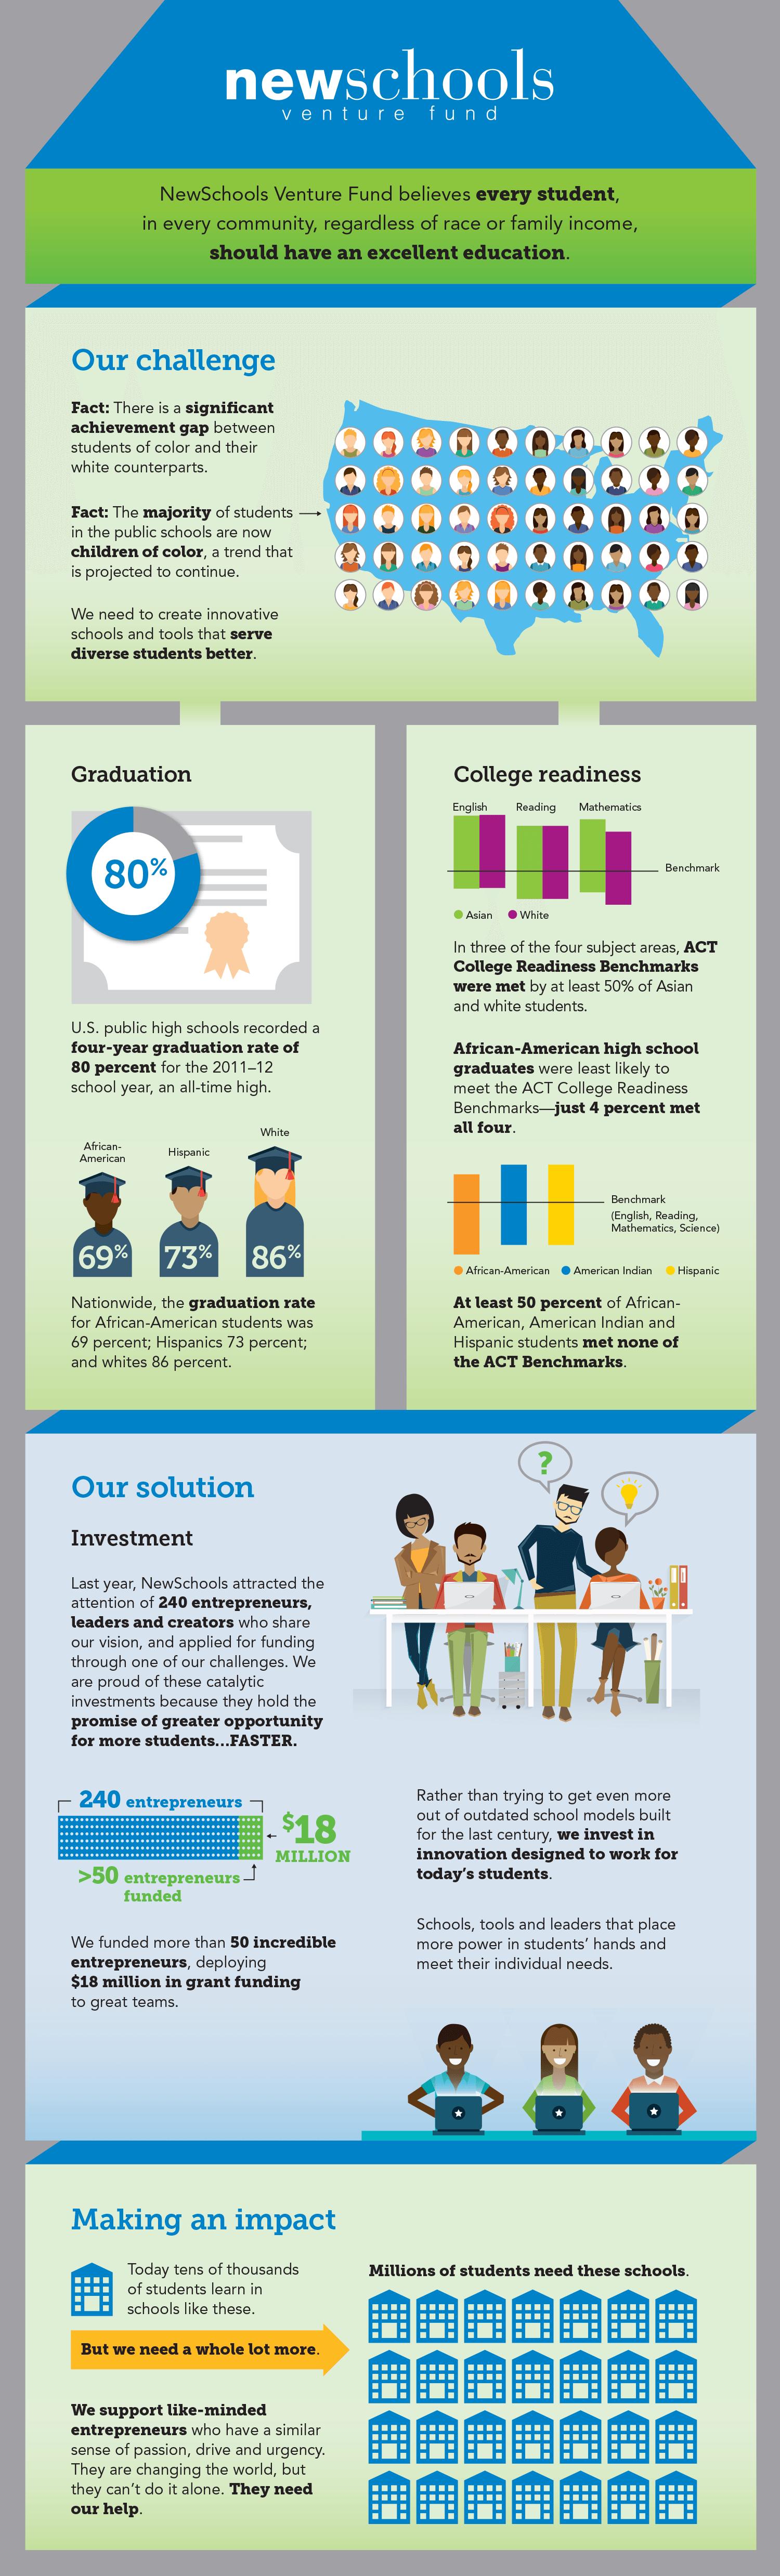 New Schools Venture Fund Education Infographic